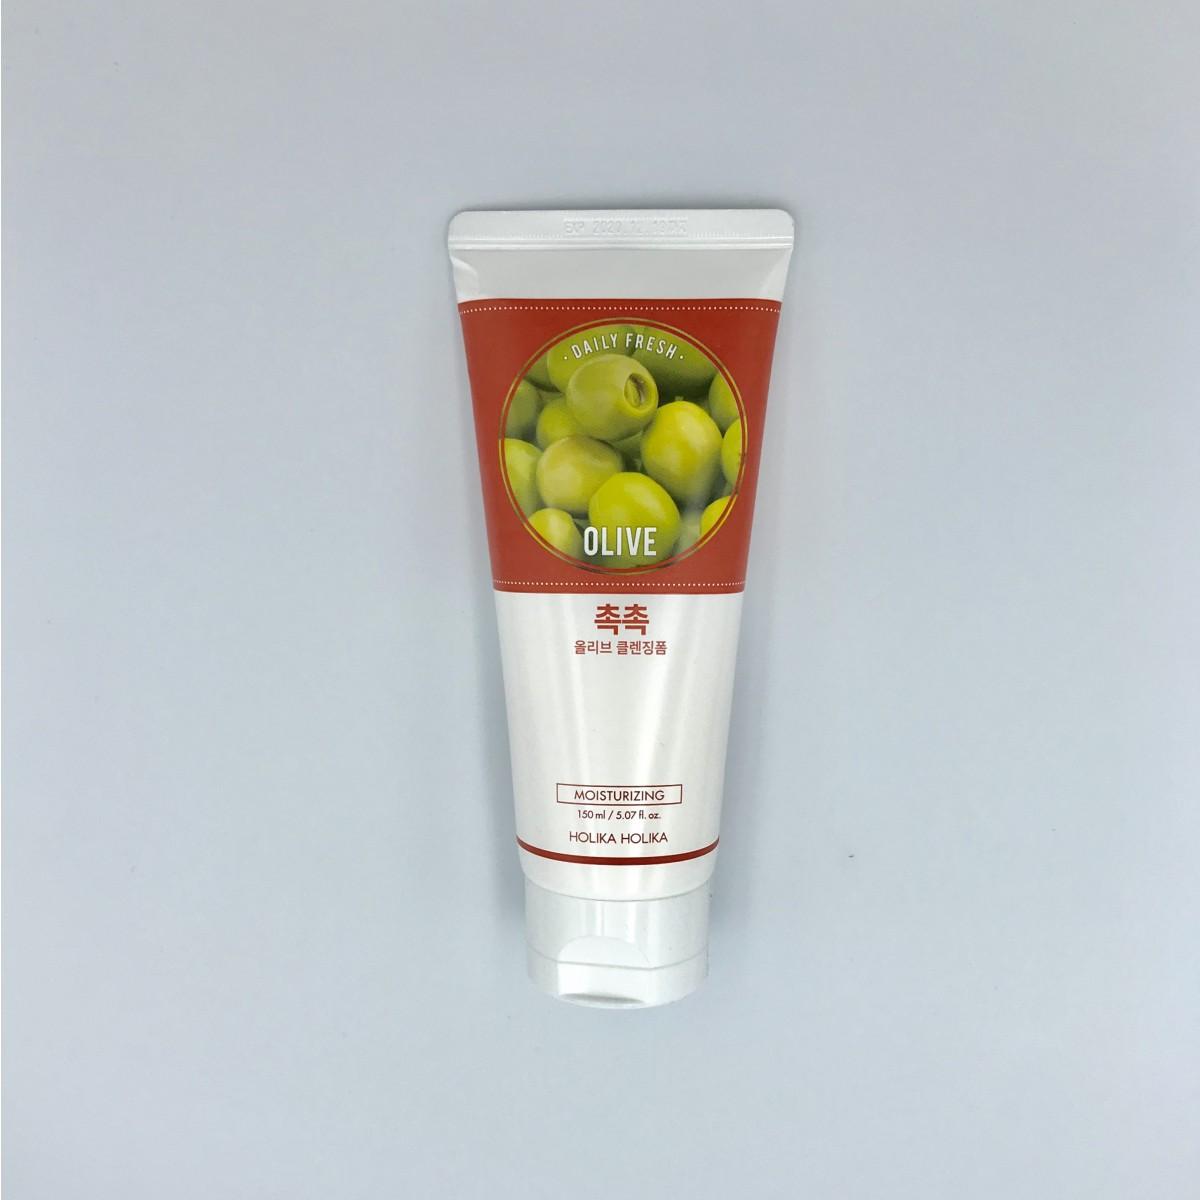 Очищающая пенка для лица с оливой Holika Holika Daily Fresh Cleansing Olive Cleansing Foam - 150 мл